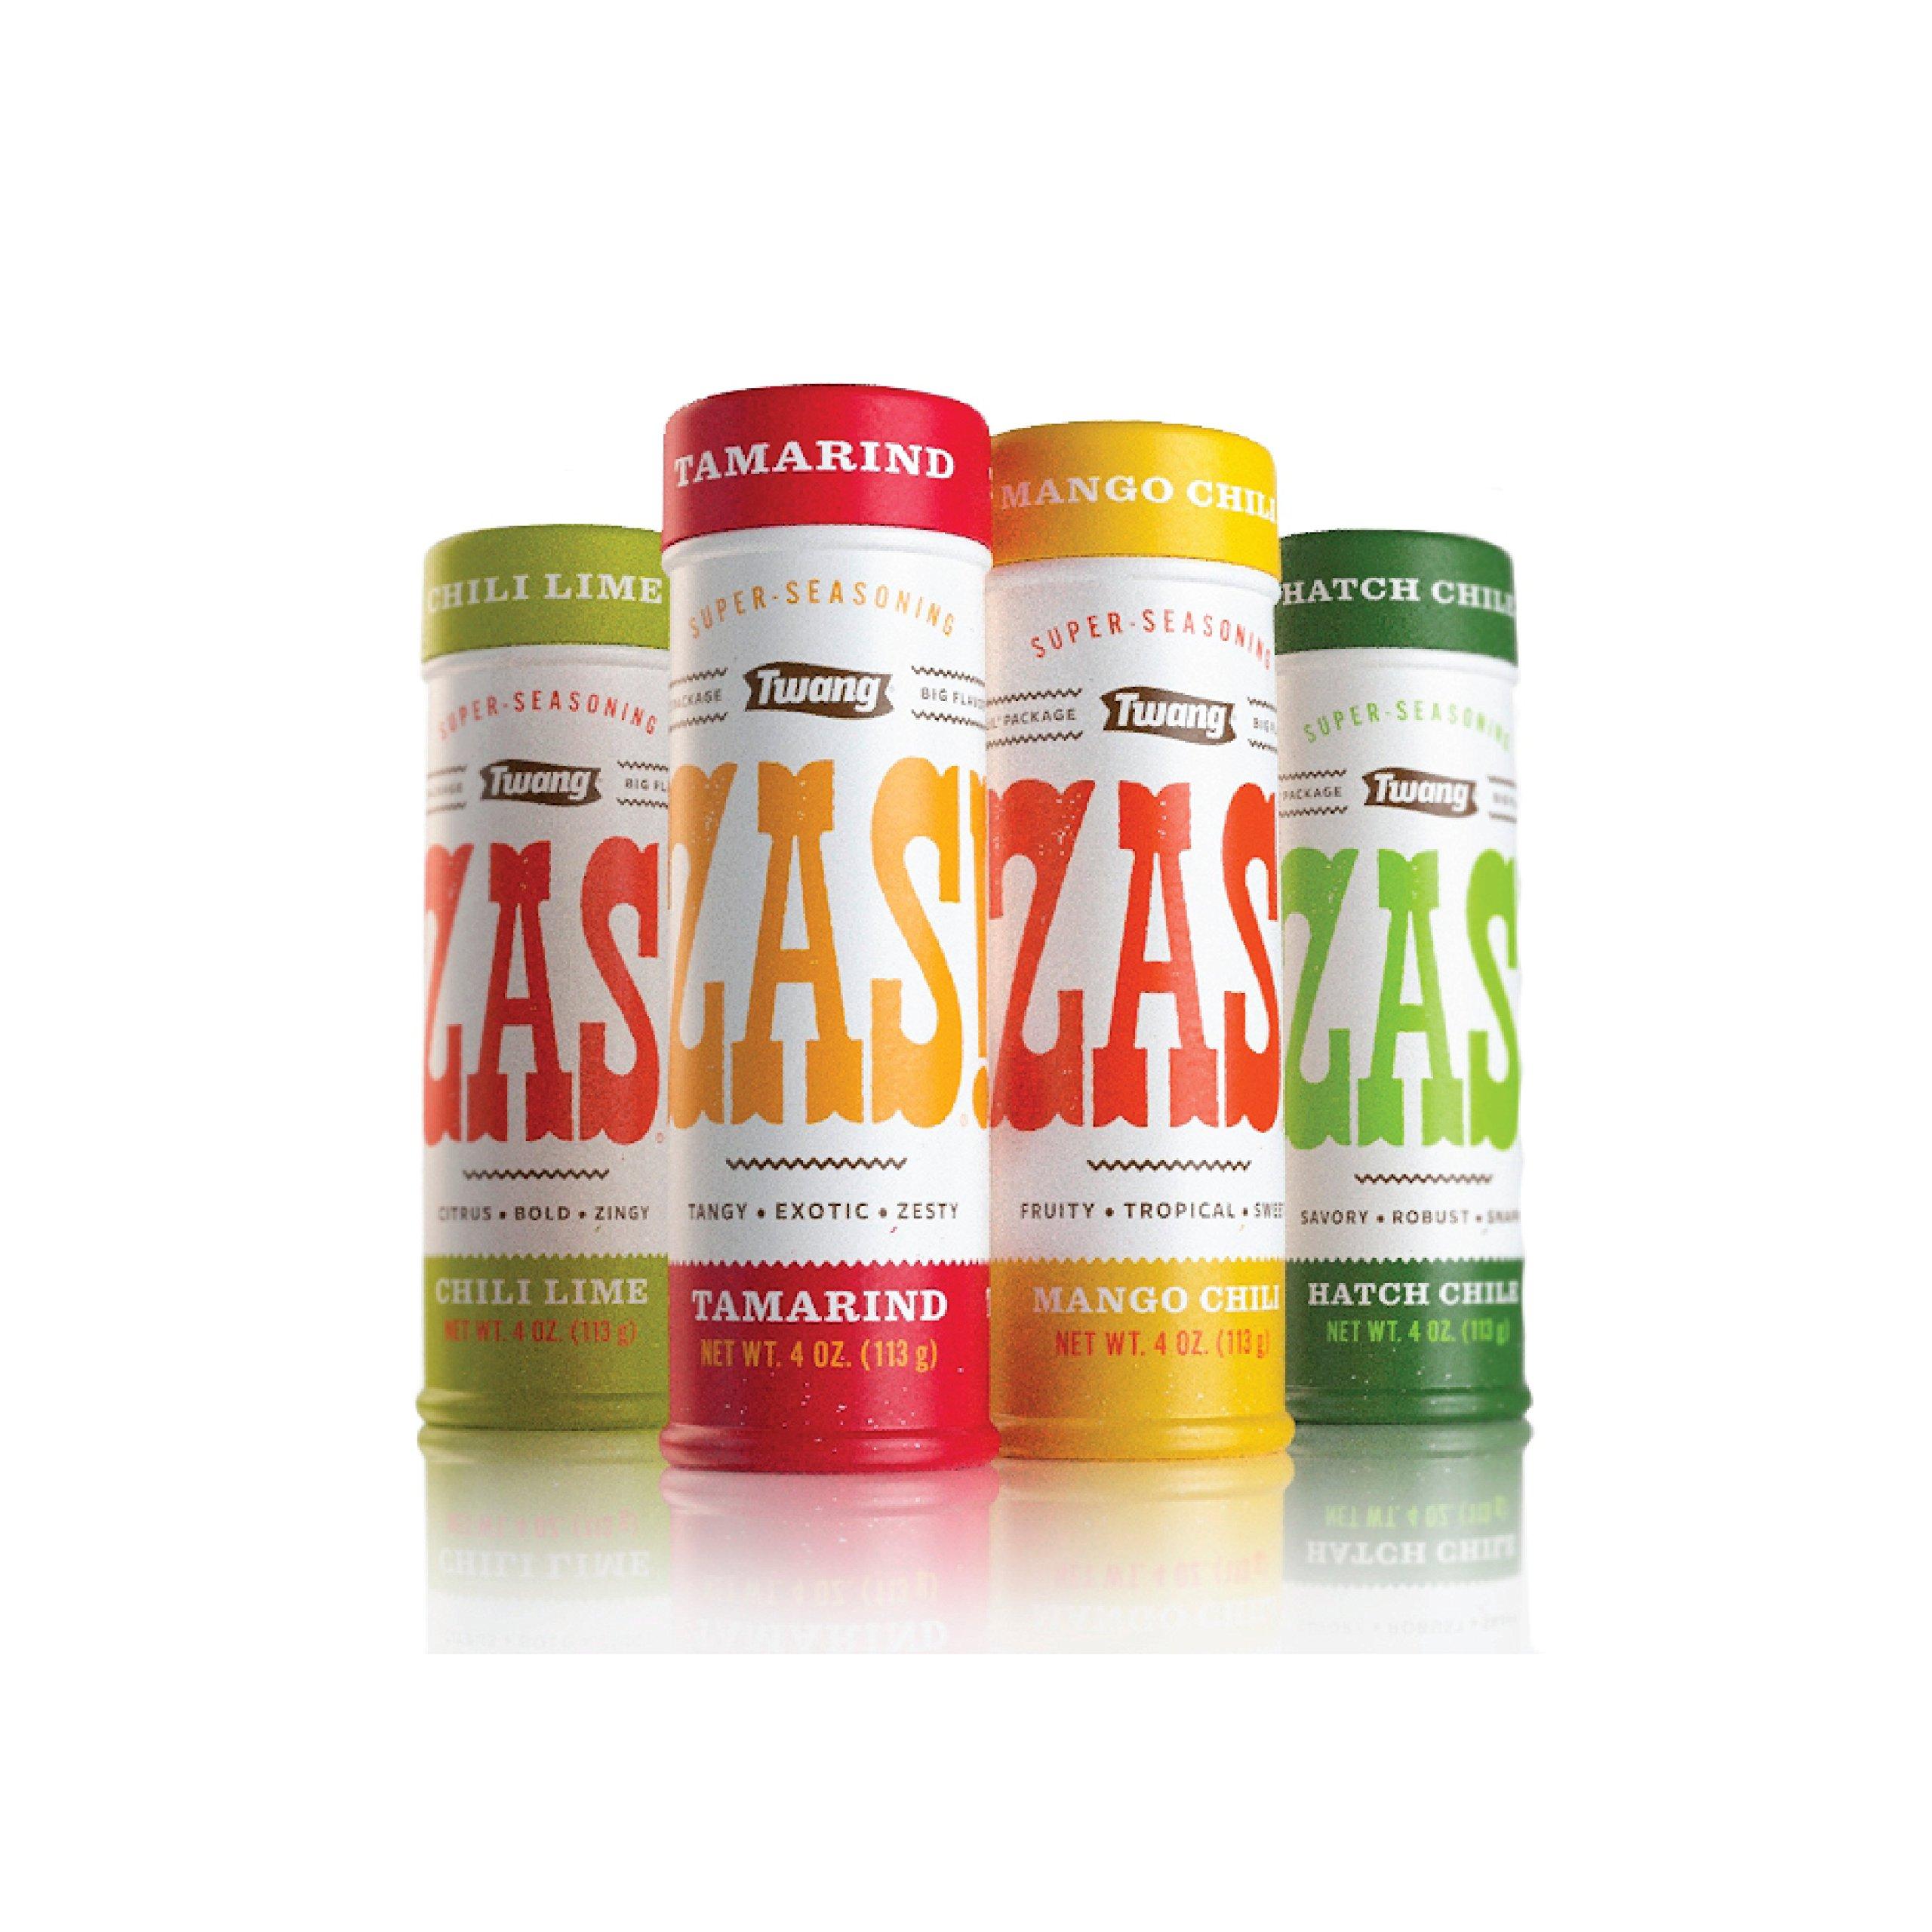 Twang Food Seasoning, ZAS! Super-Seasoning Variety Pack, Salt Flavoring, 4 Ounce Jars, 4 Count, 1 each of Chili-Lime, Mango Chili, Tamarind, Hatch Chile